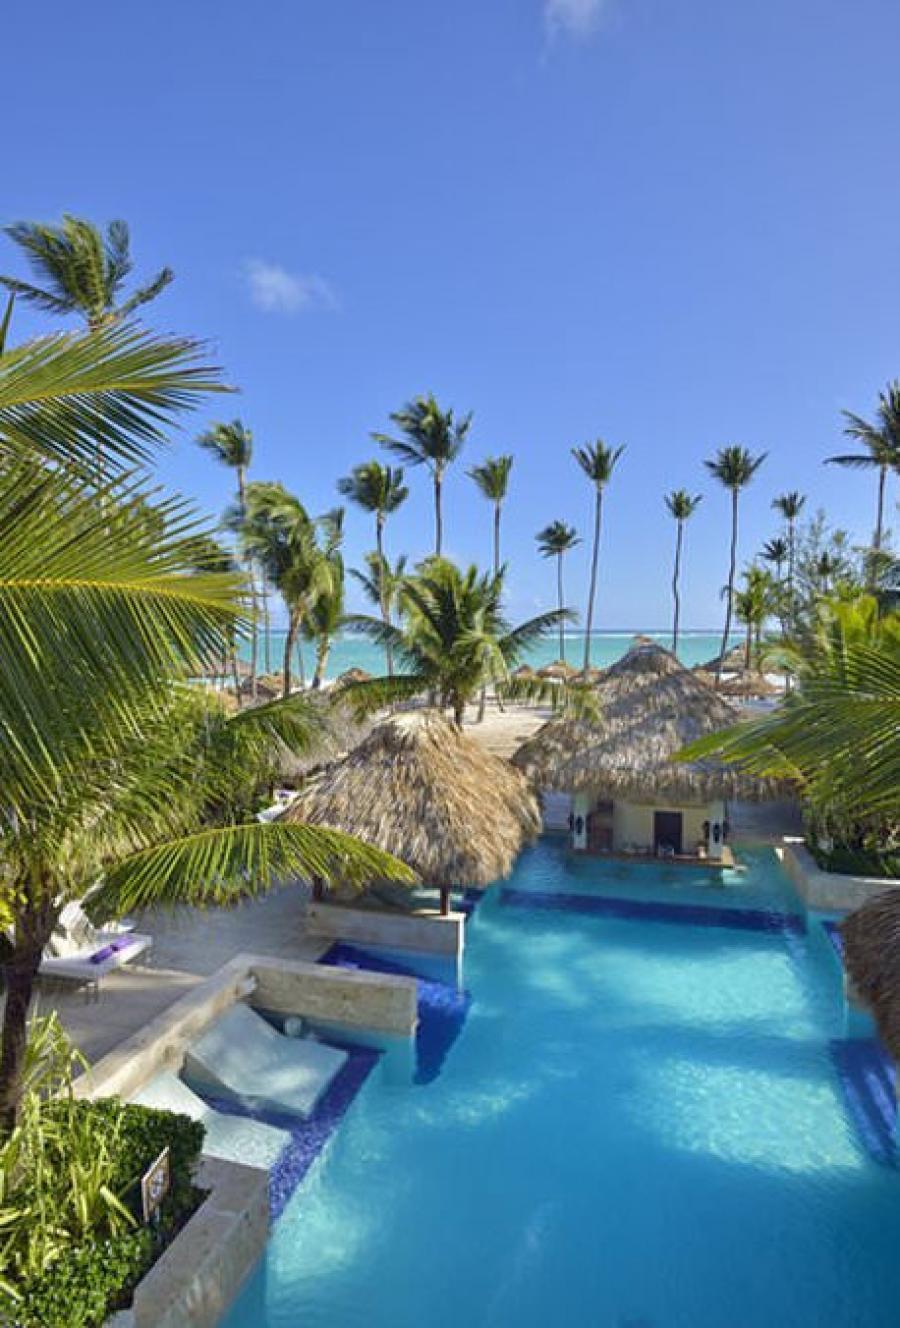 Paradisus punta cana all inclusive beach resort for Punta cana dominican republic vacation